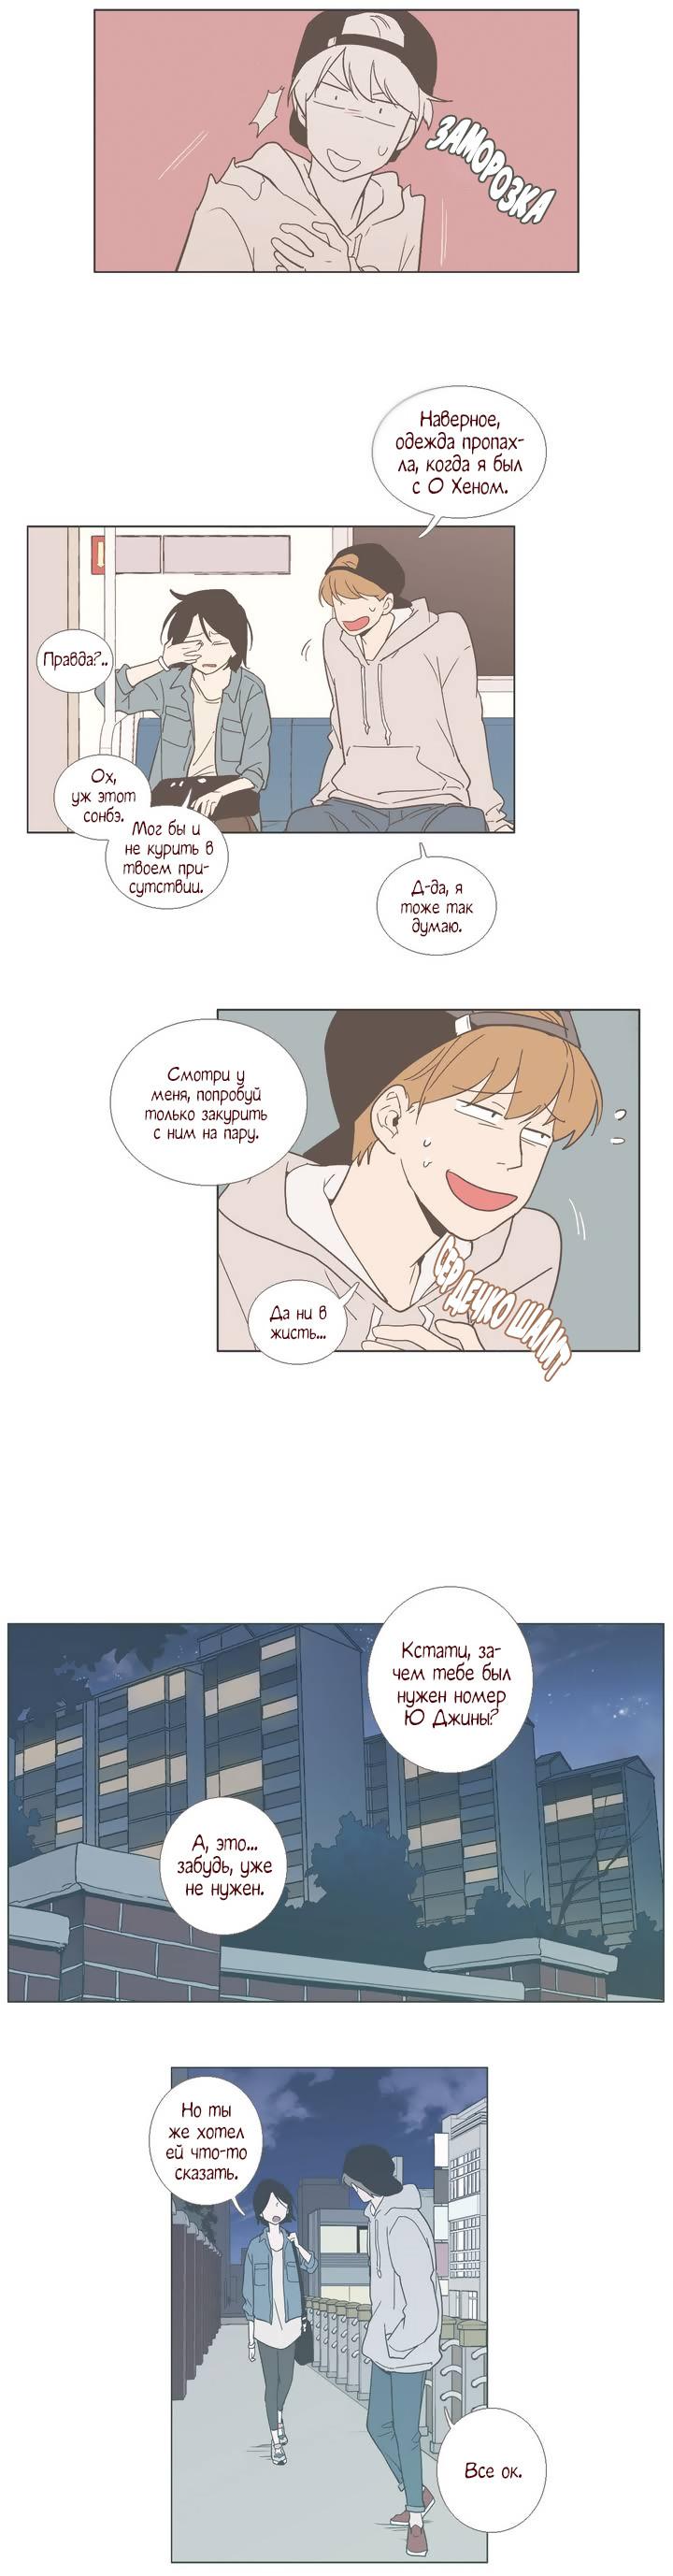 https://r1.ninemanga.com/comics/pic2/12/22860/304669/1467296191690.jpg Page 3